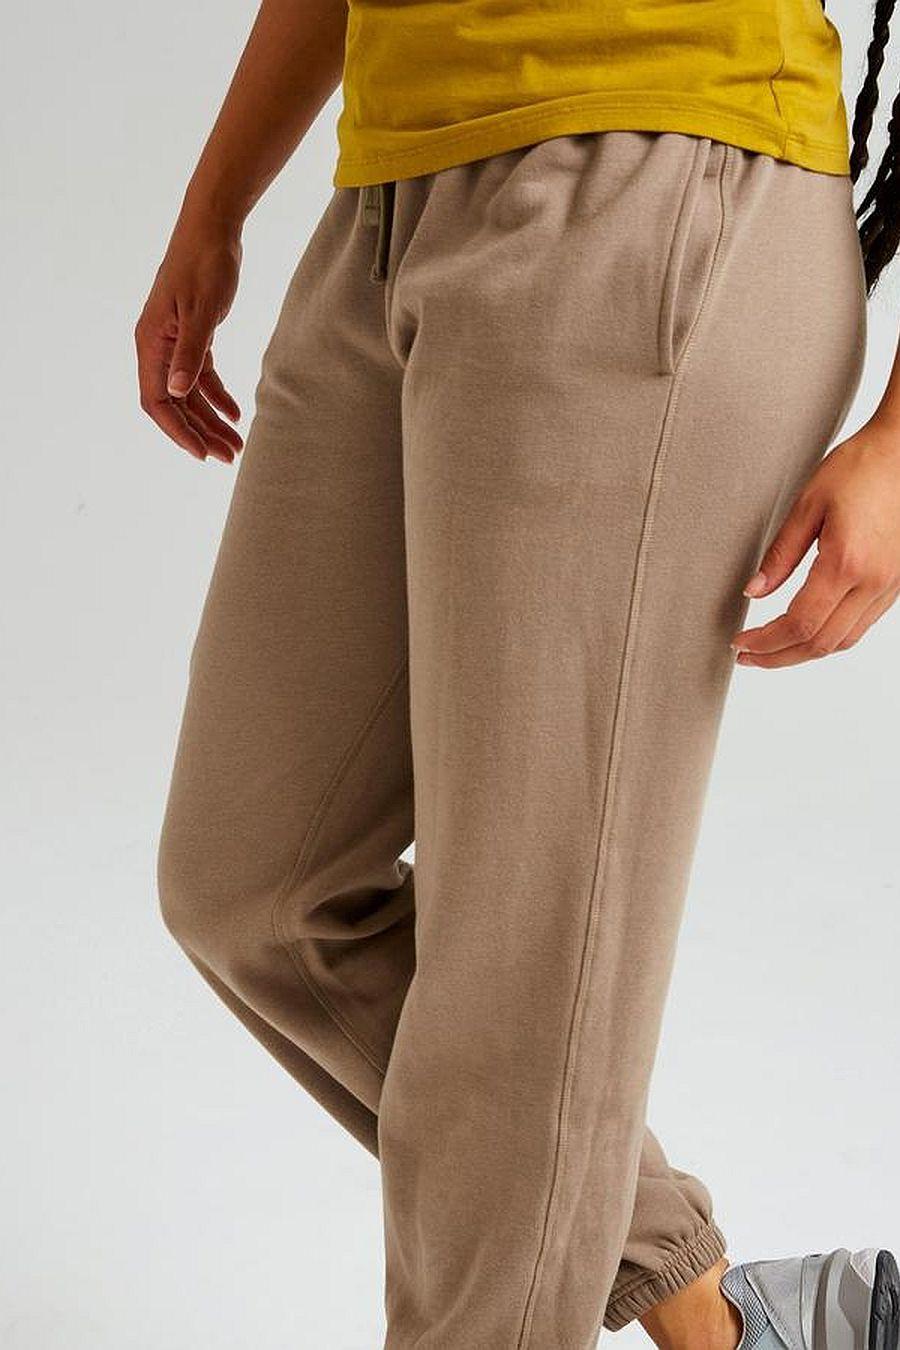 Richer Poorer Recycled Fleece Sweatpant - Warm Grey